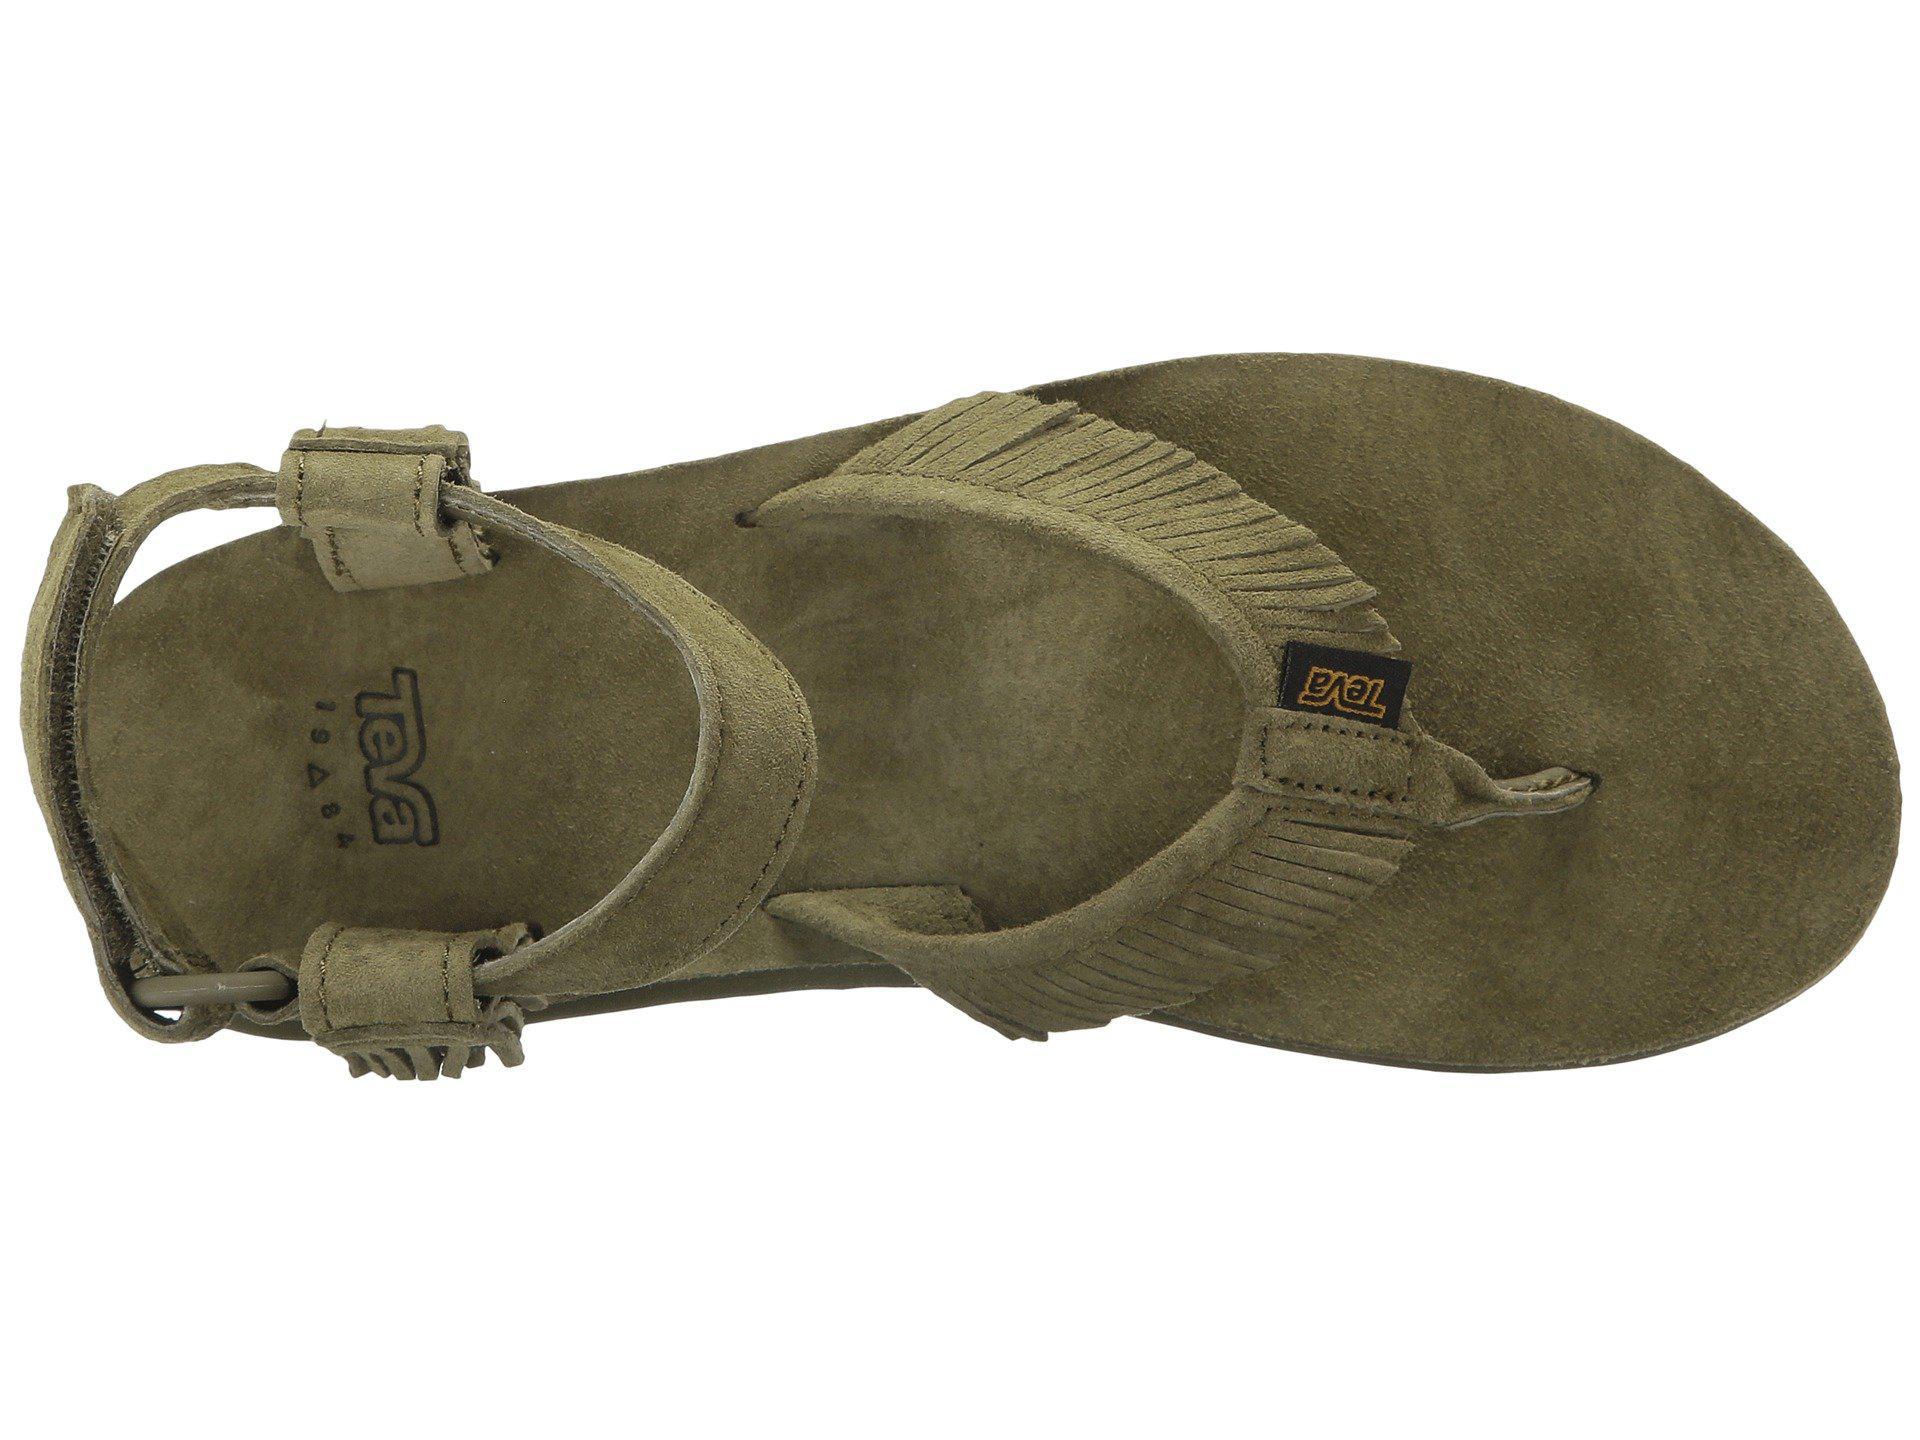 7c27a8d628b0 Teva - Green Original Sandal Leather Fringe - Lyst. View fullscreen